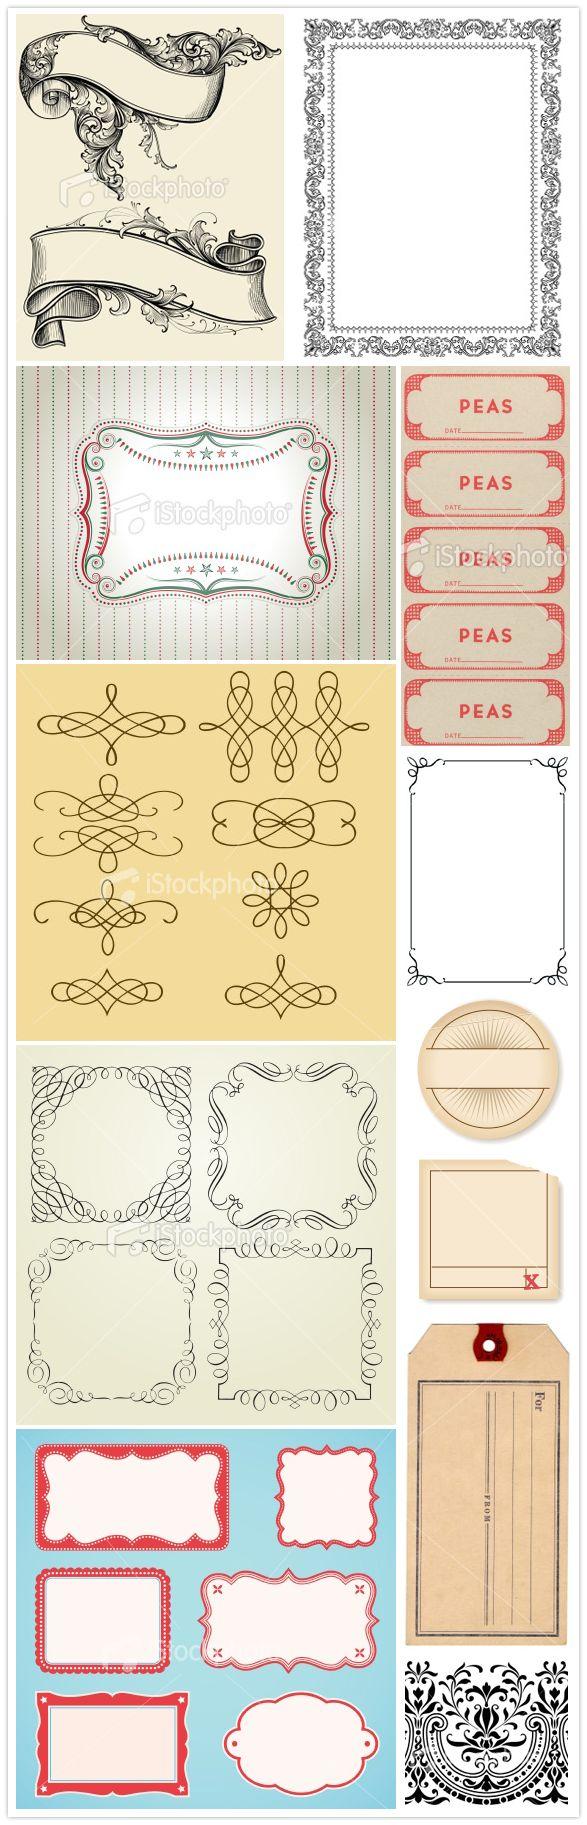 Free vintage printables #free #printable #vintage #antique #craft #diy #label #tag #sign #print #paper